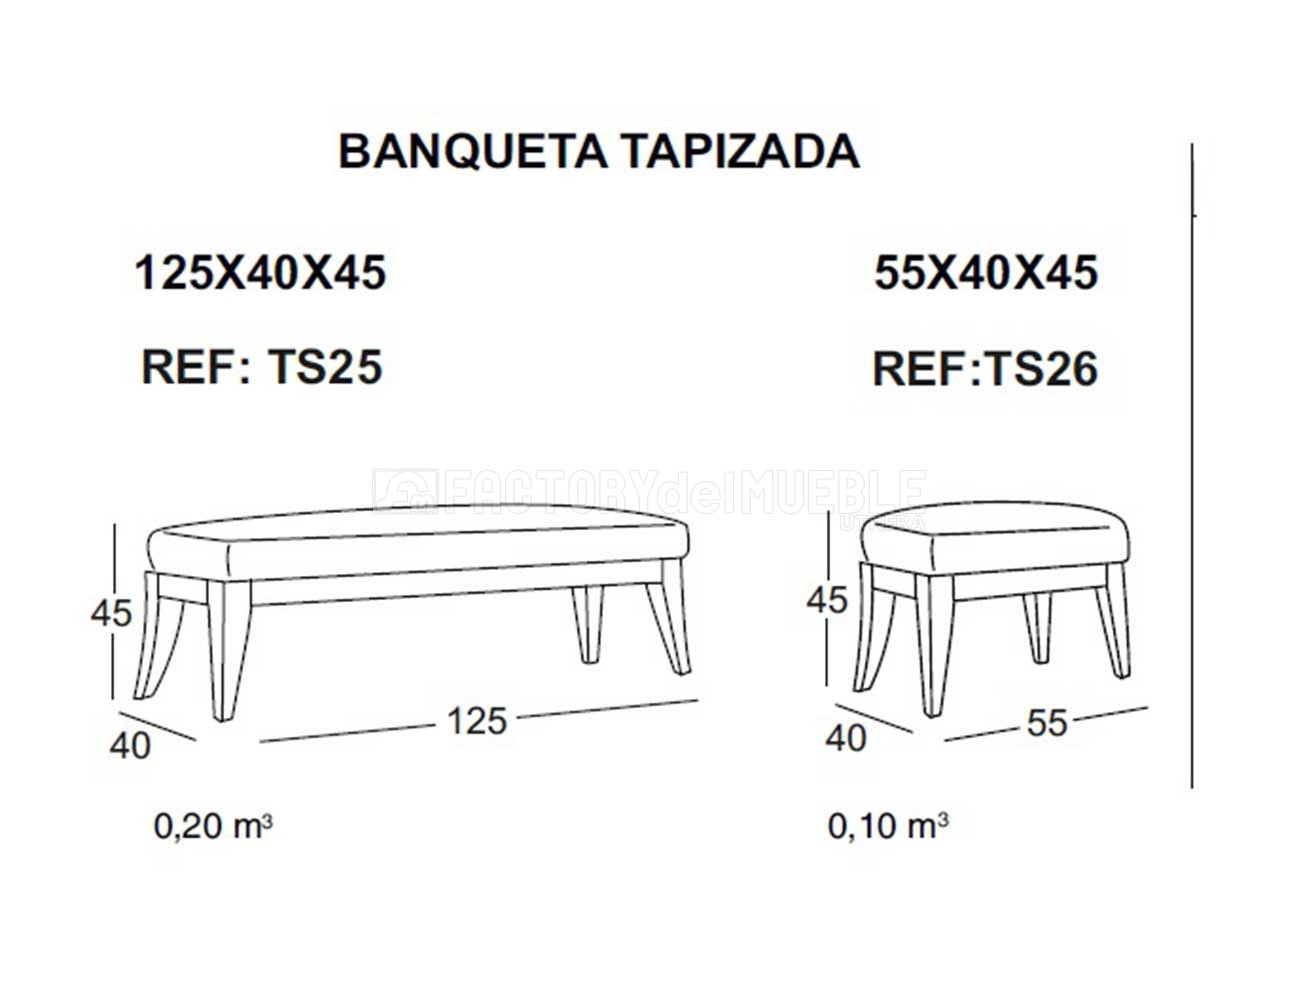 Banqueta ts25